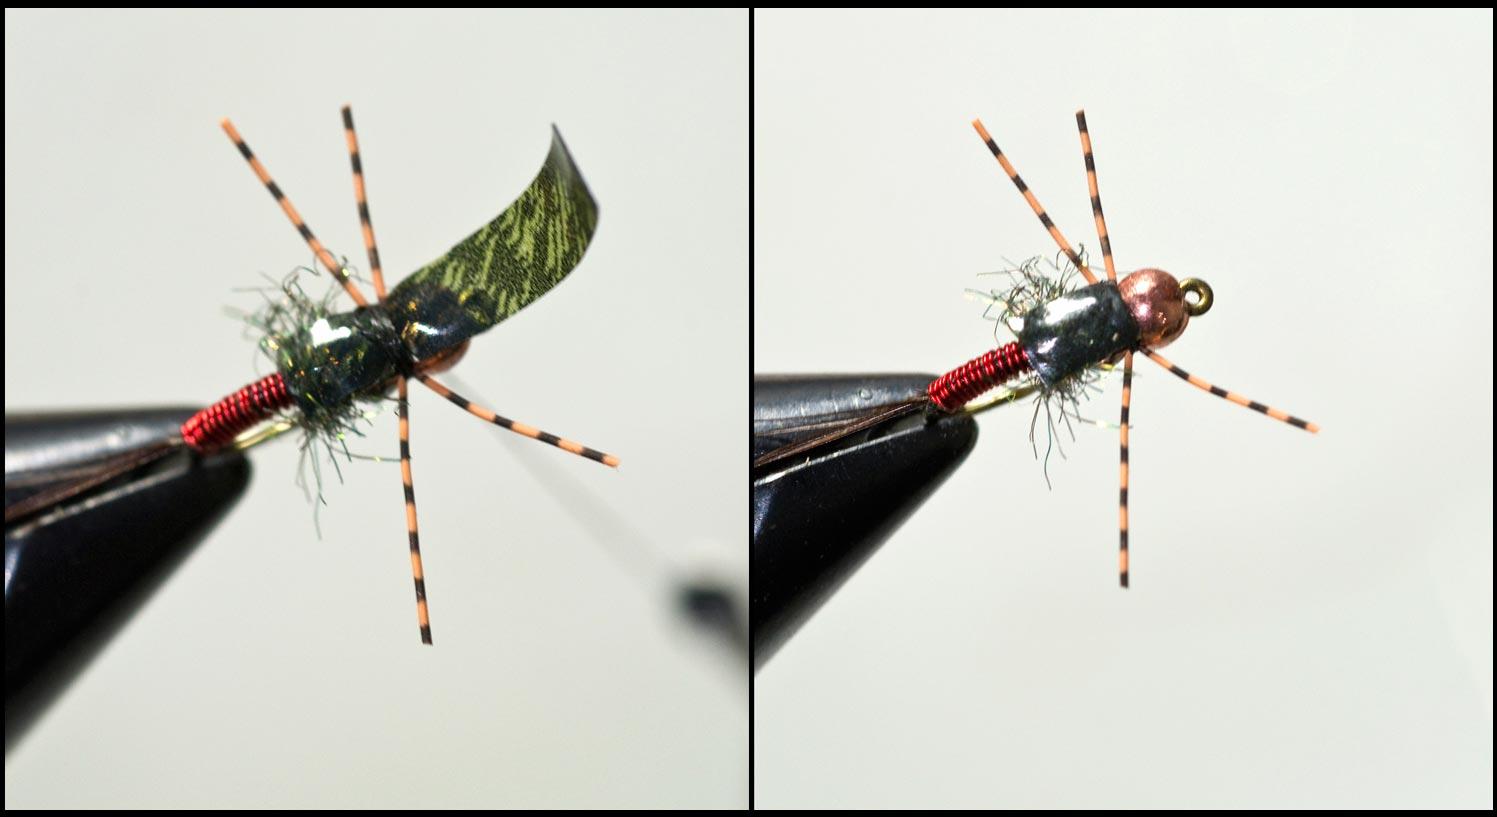 fly-tying-thin-skin